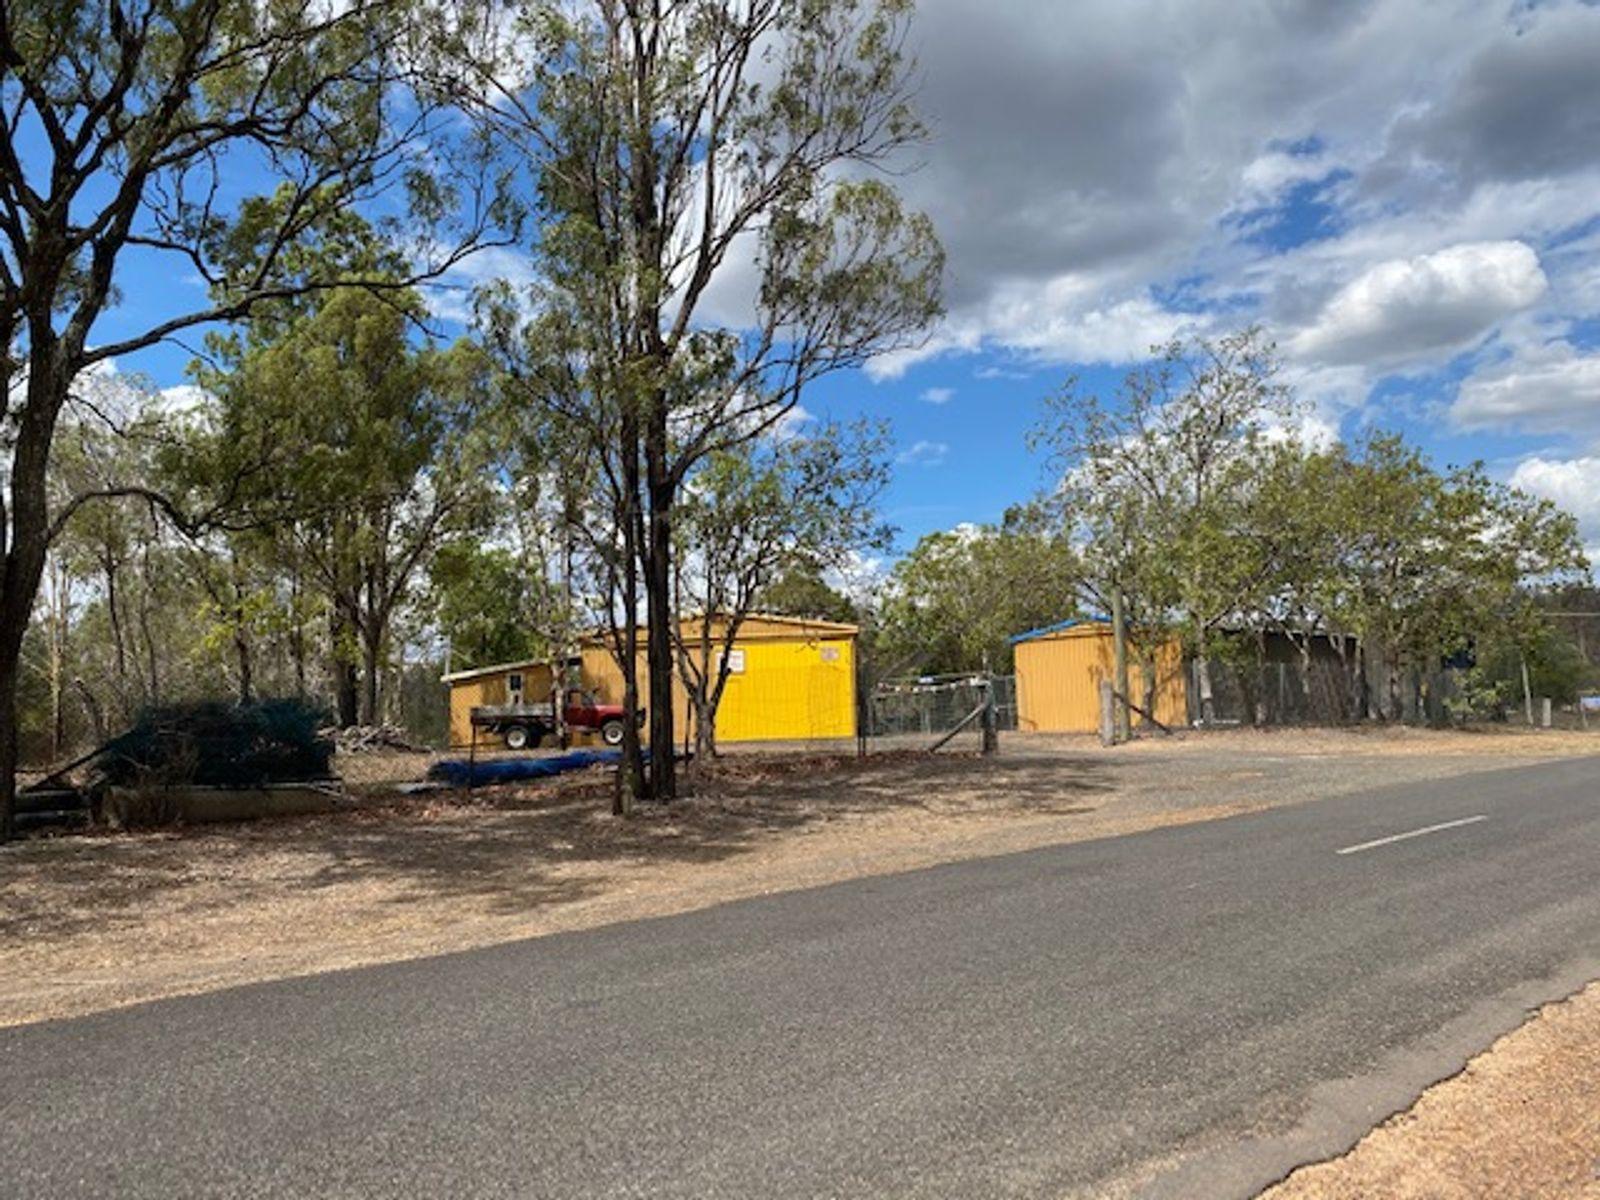 57 Milne, Laidley, QLD 4341